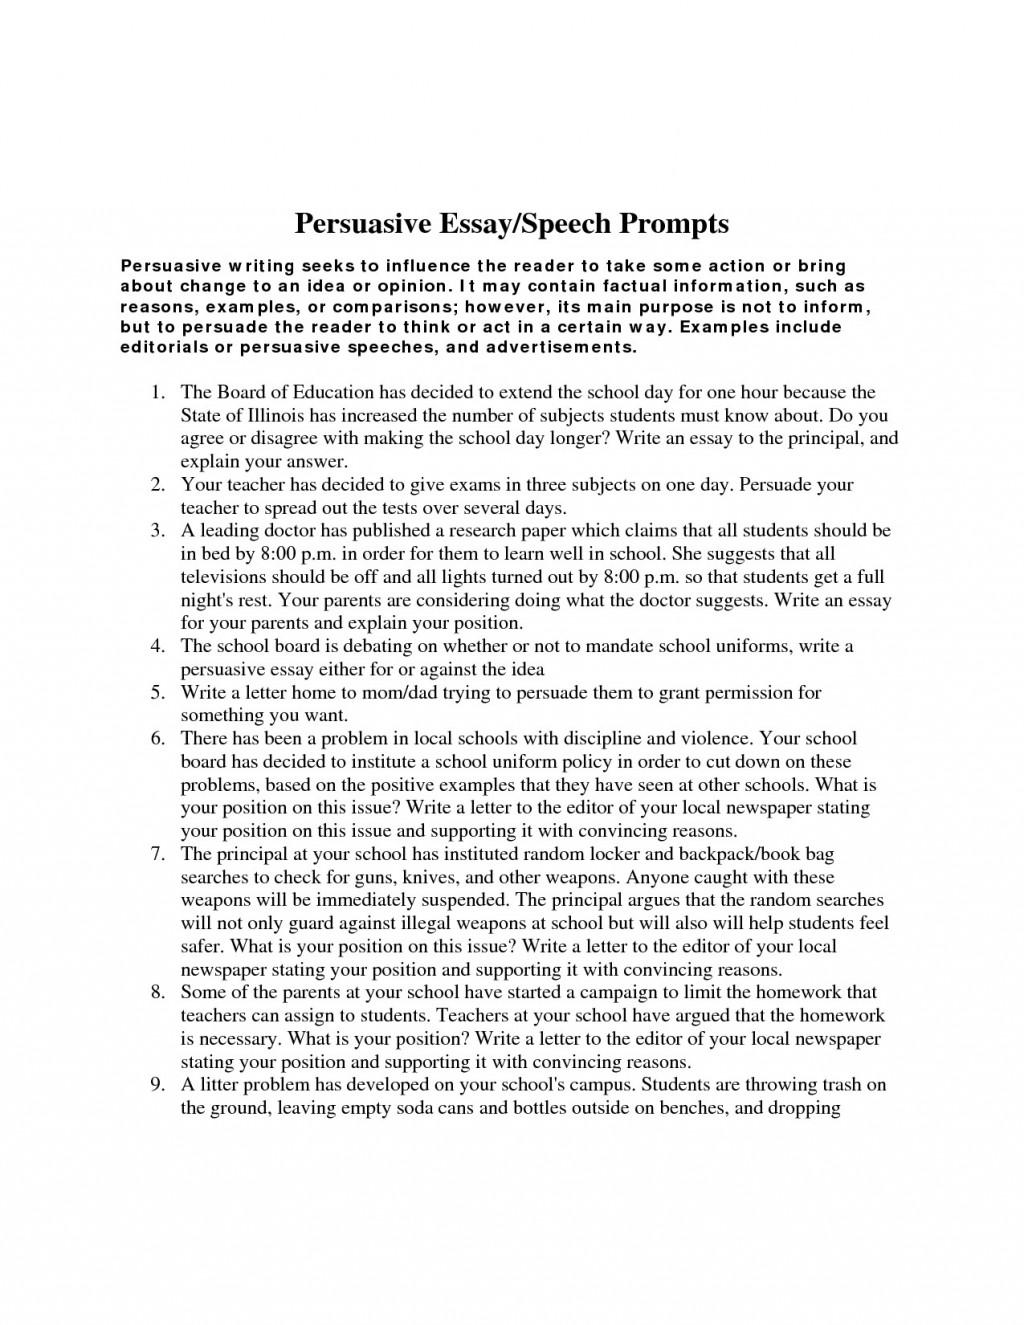 005 Argumentative Essay Definition Sarcastic Essays Original Topics On Types Of Argument Irony In Liter Fearsome Define Persuasive/argumentative Pdf Large